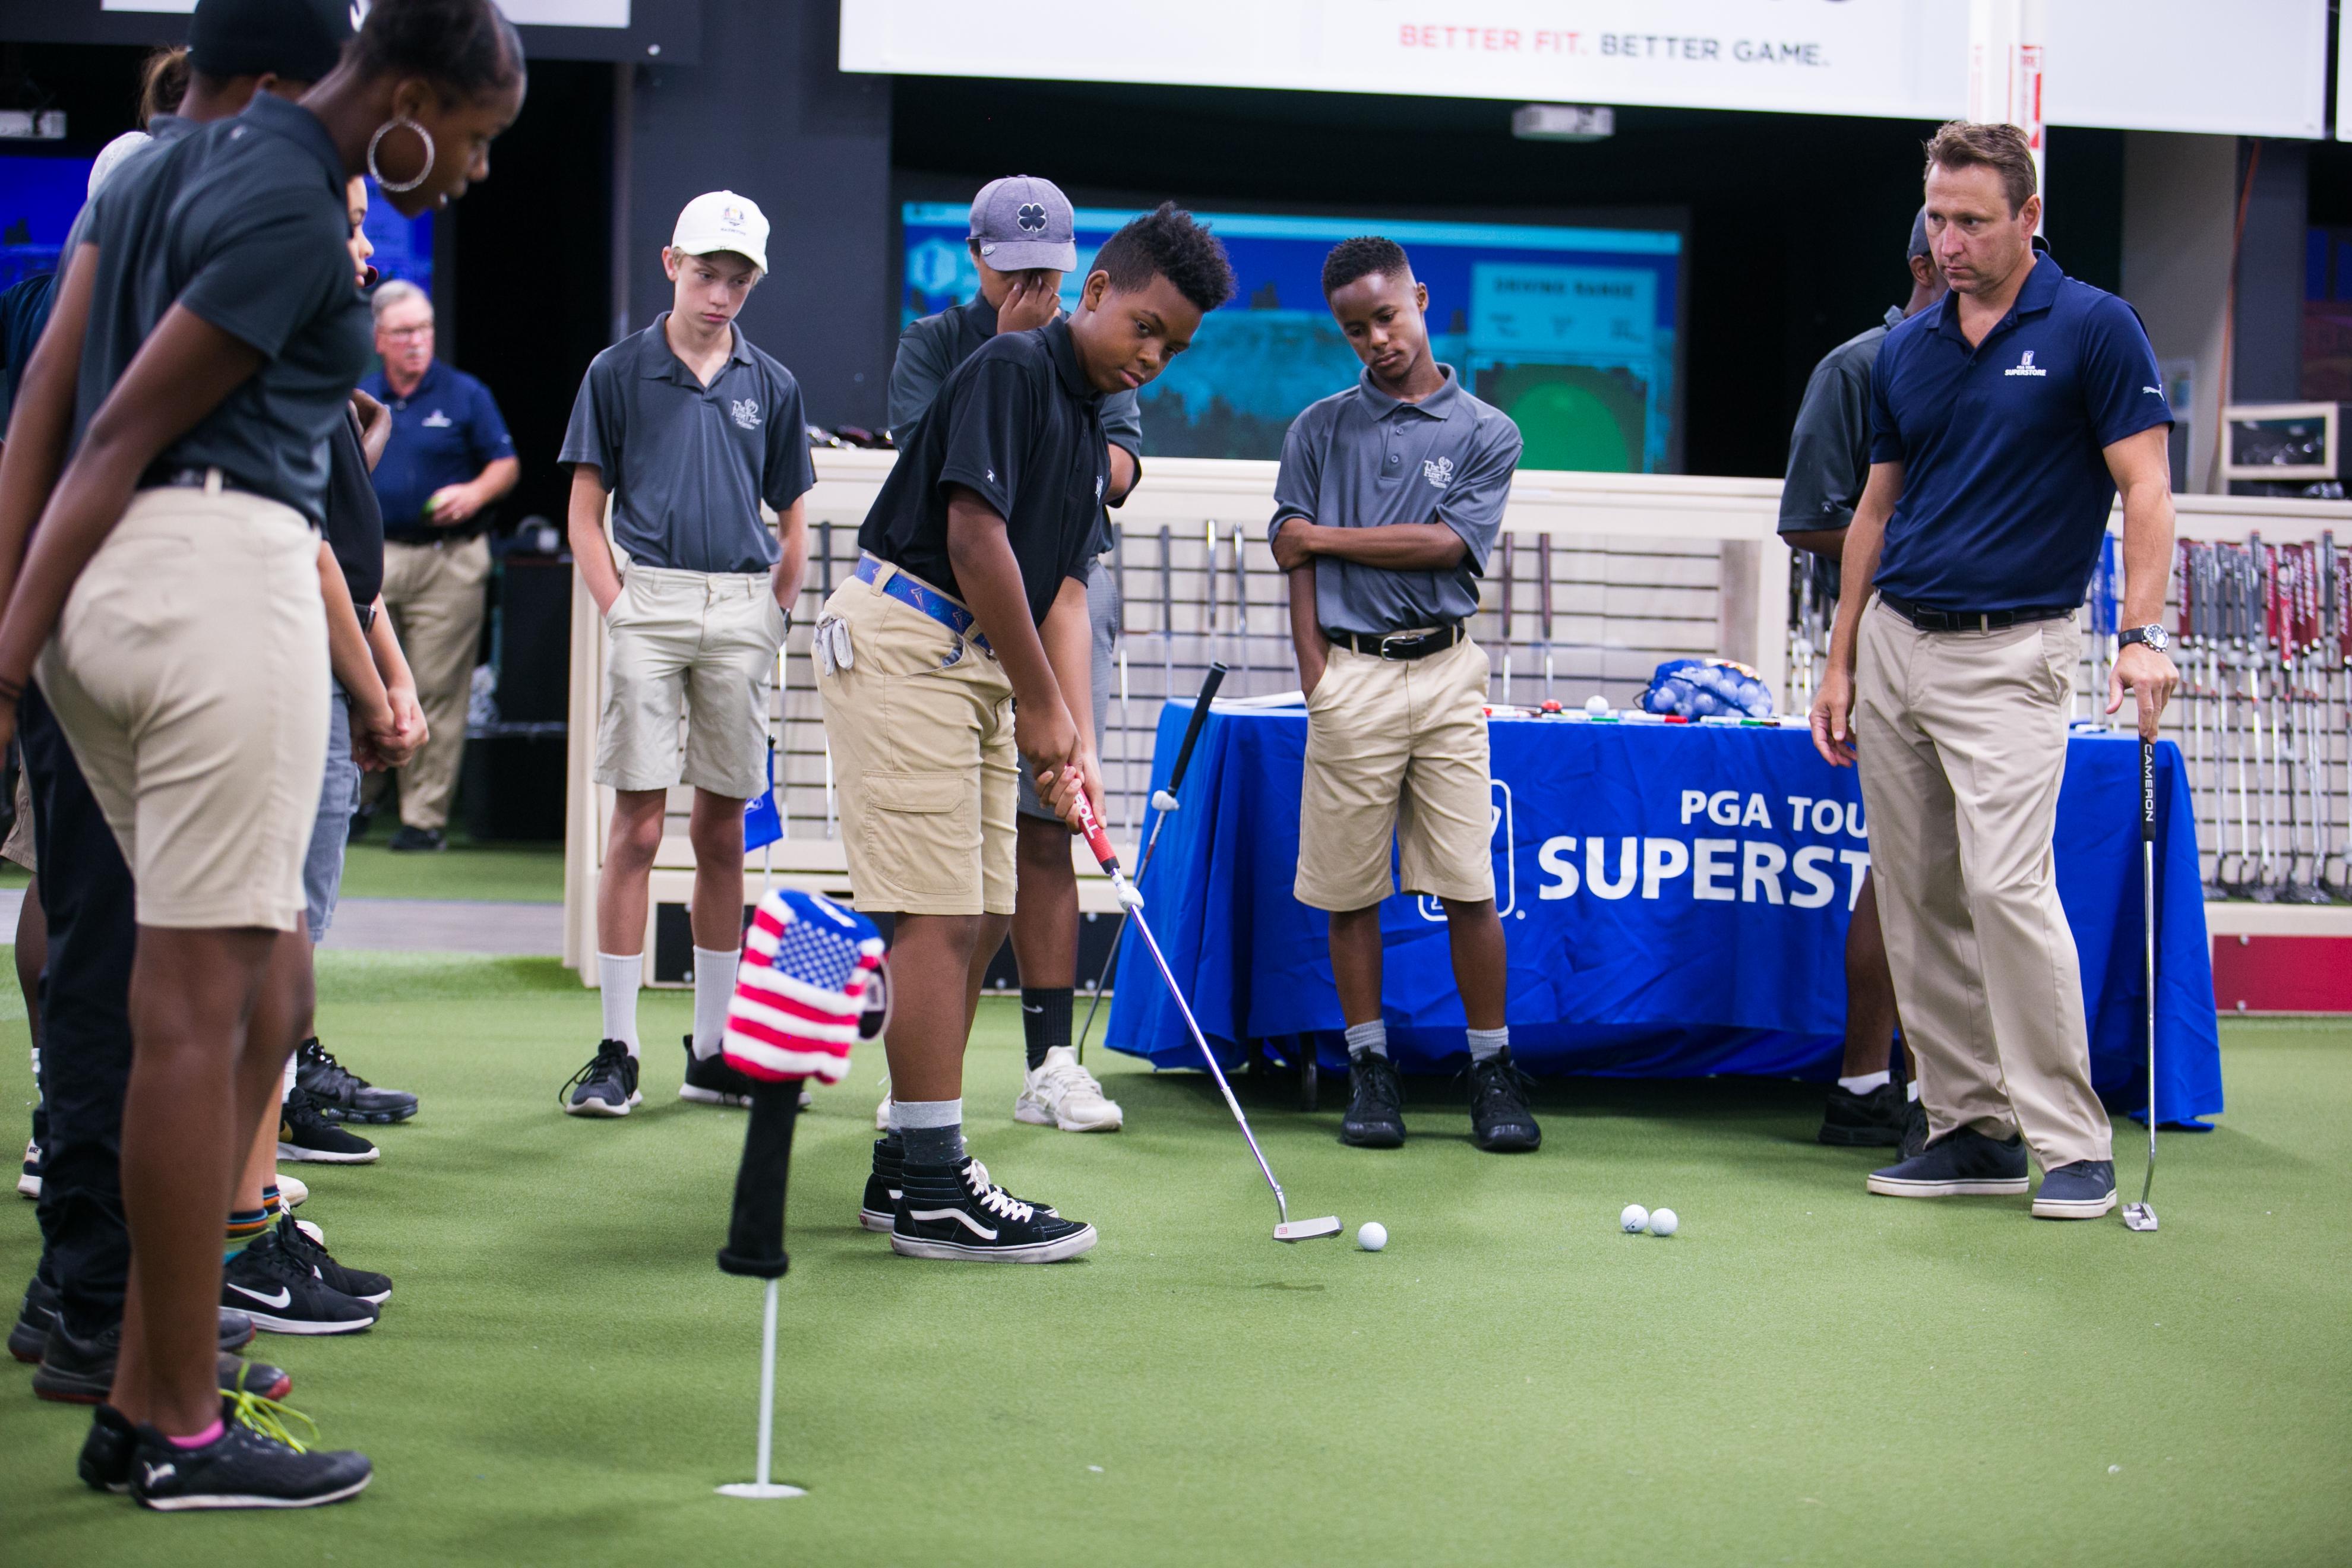 ©2019 Decisive Moment Event Photojournalism, PGA Superstore